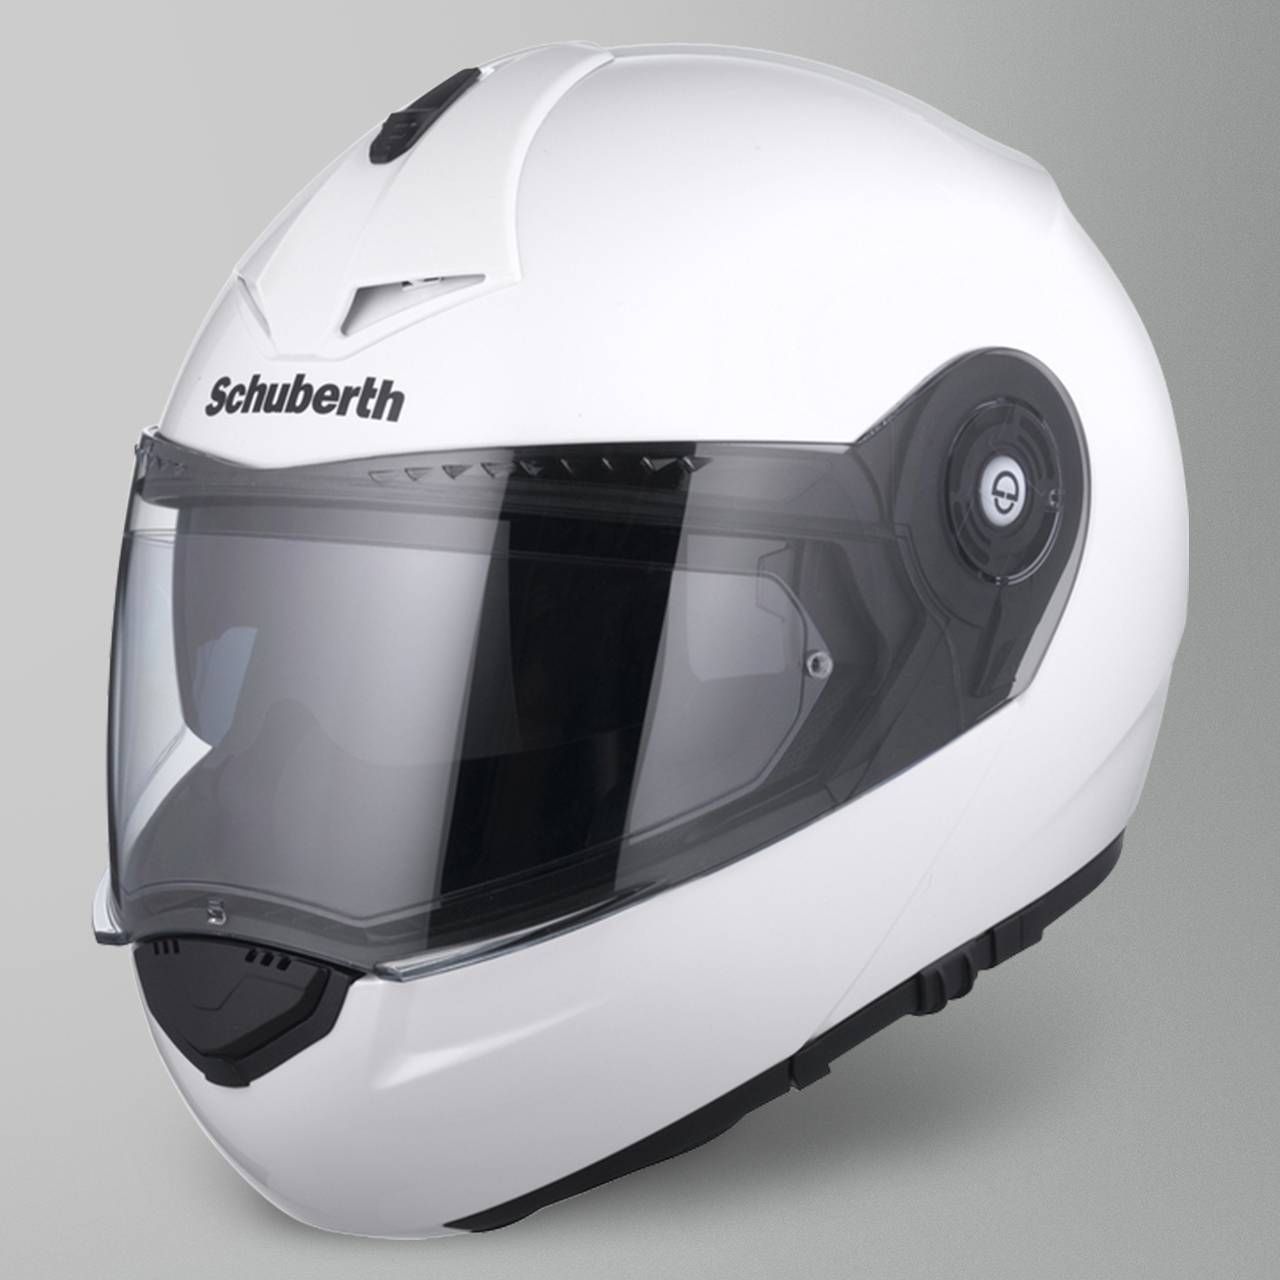 Schuberth Casco Modulare C3 Pro Bianco